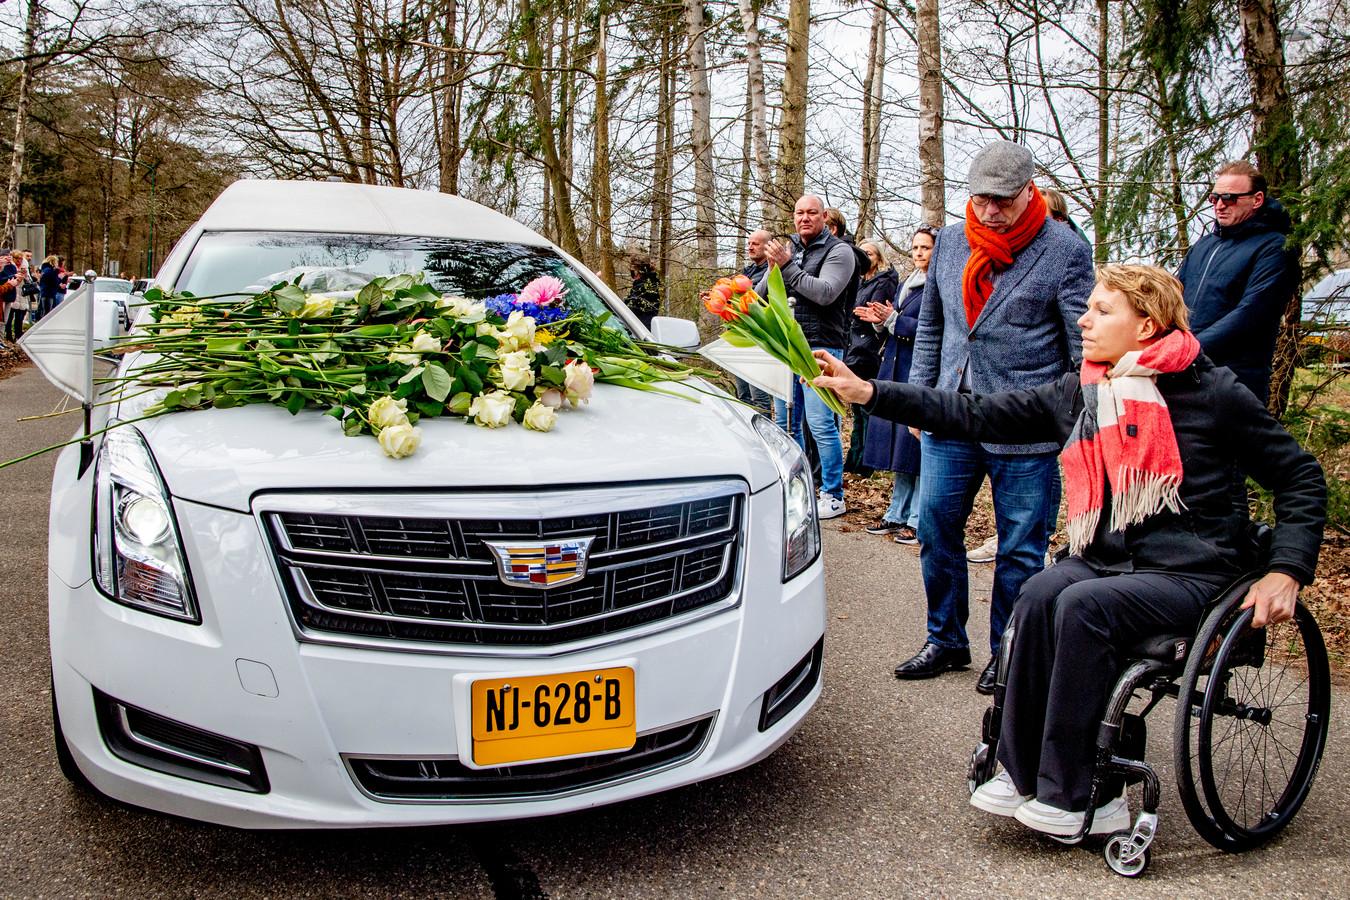 Esther Vergeer en Maurits Hendriks leggen tulpen.